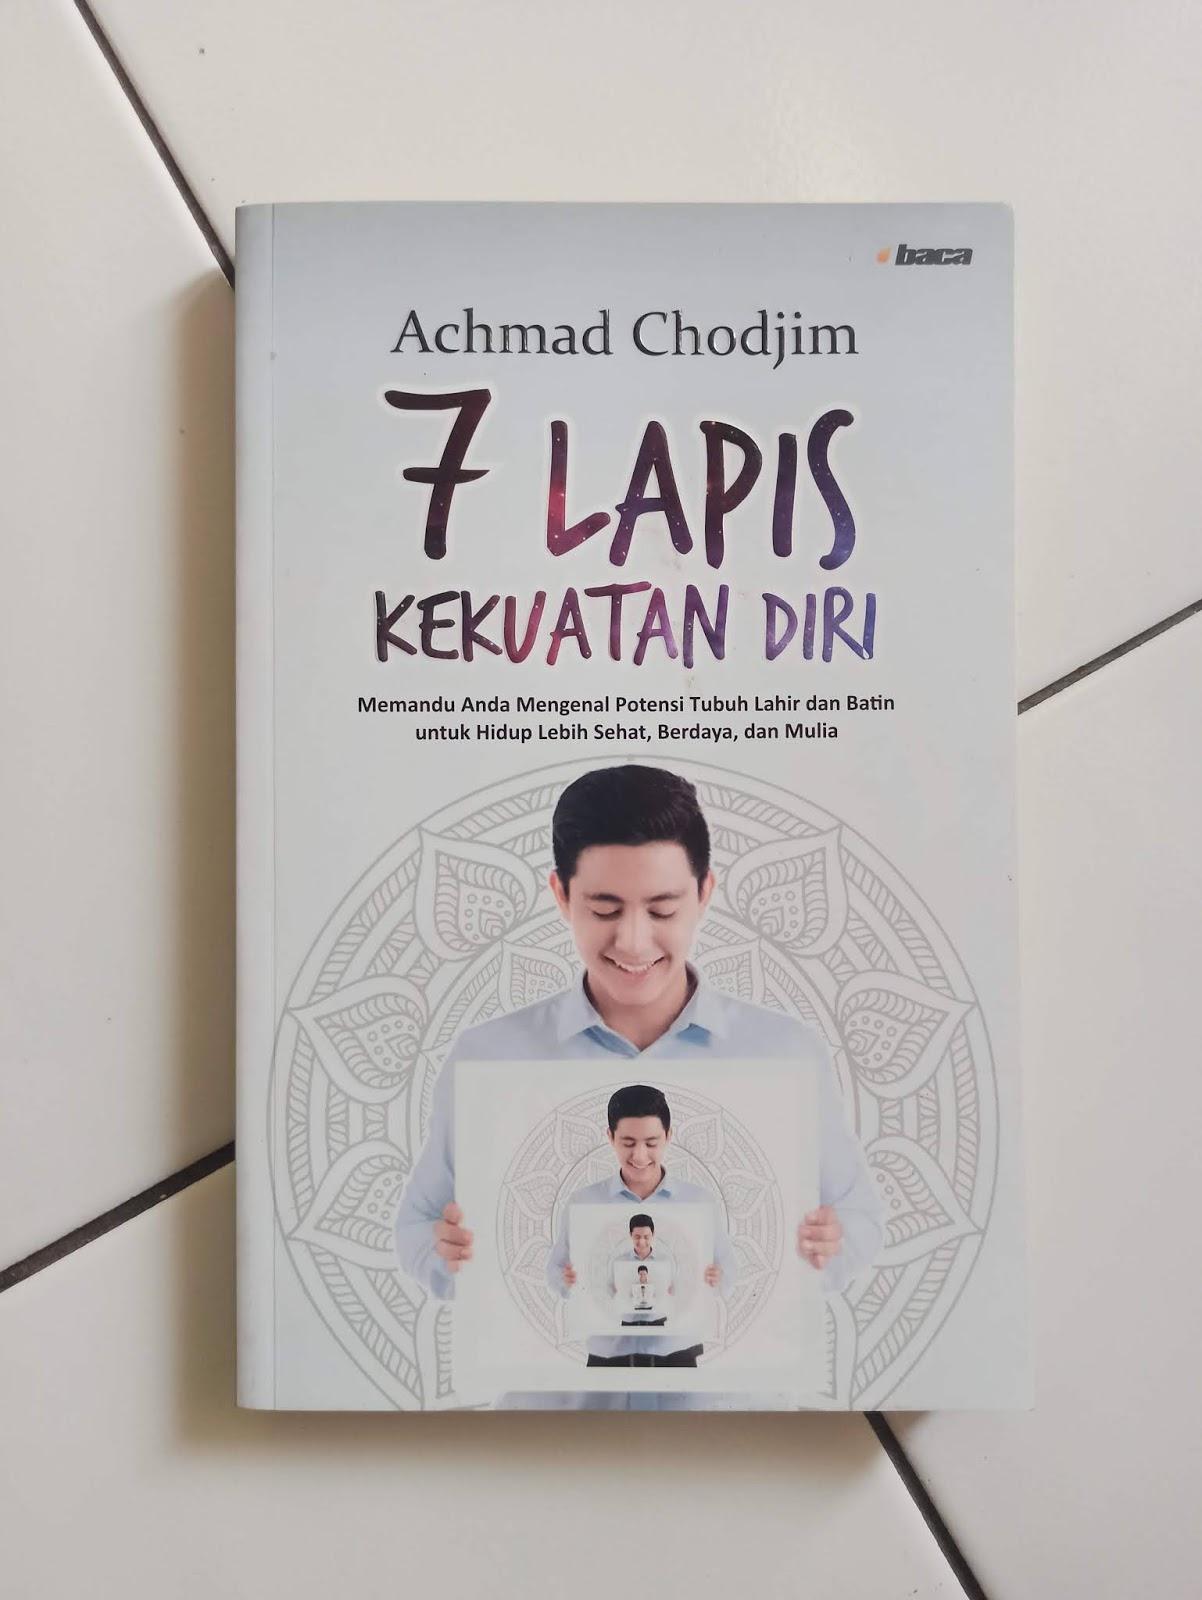 Buku Achmad Chodjim